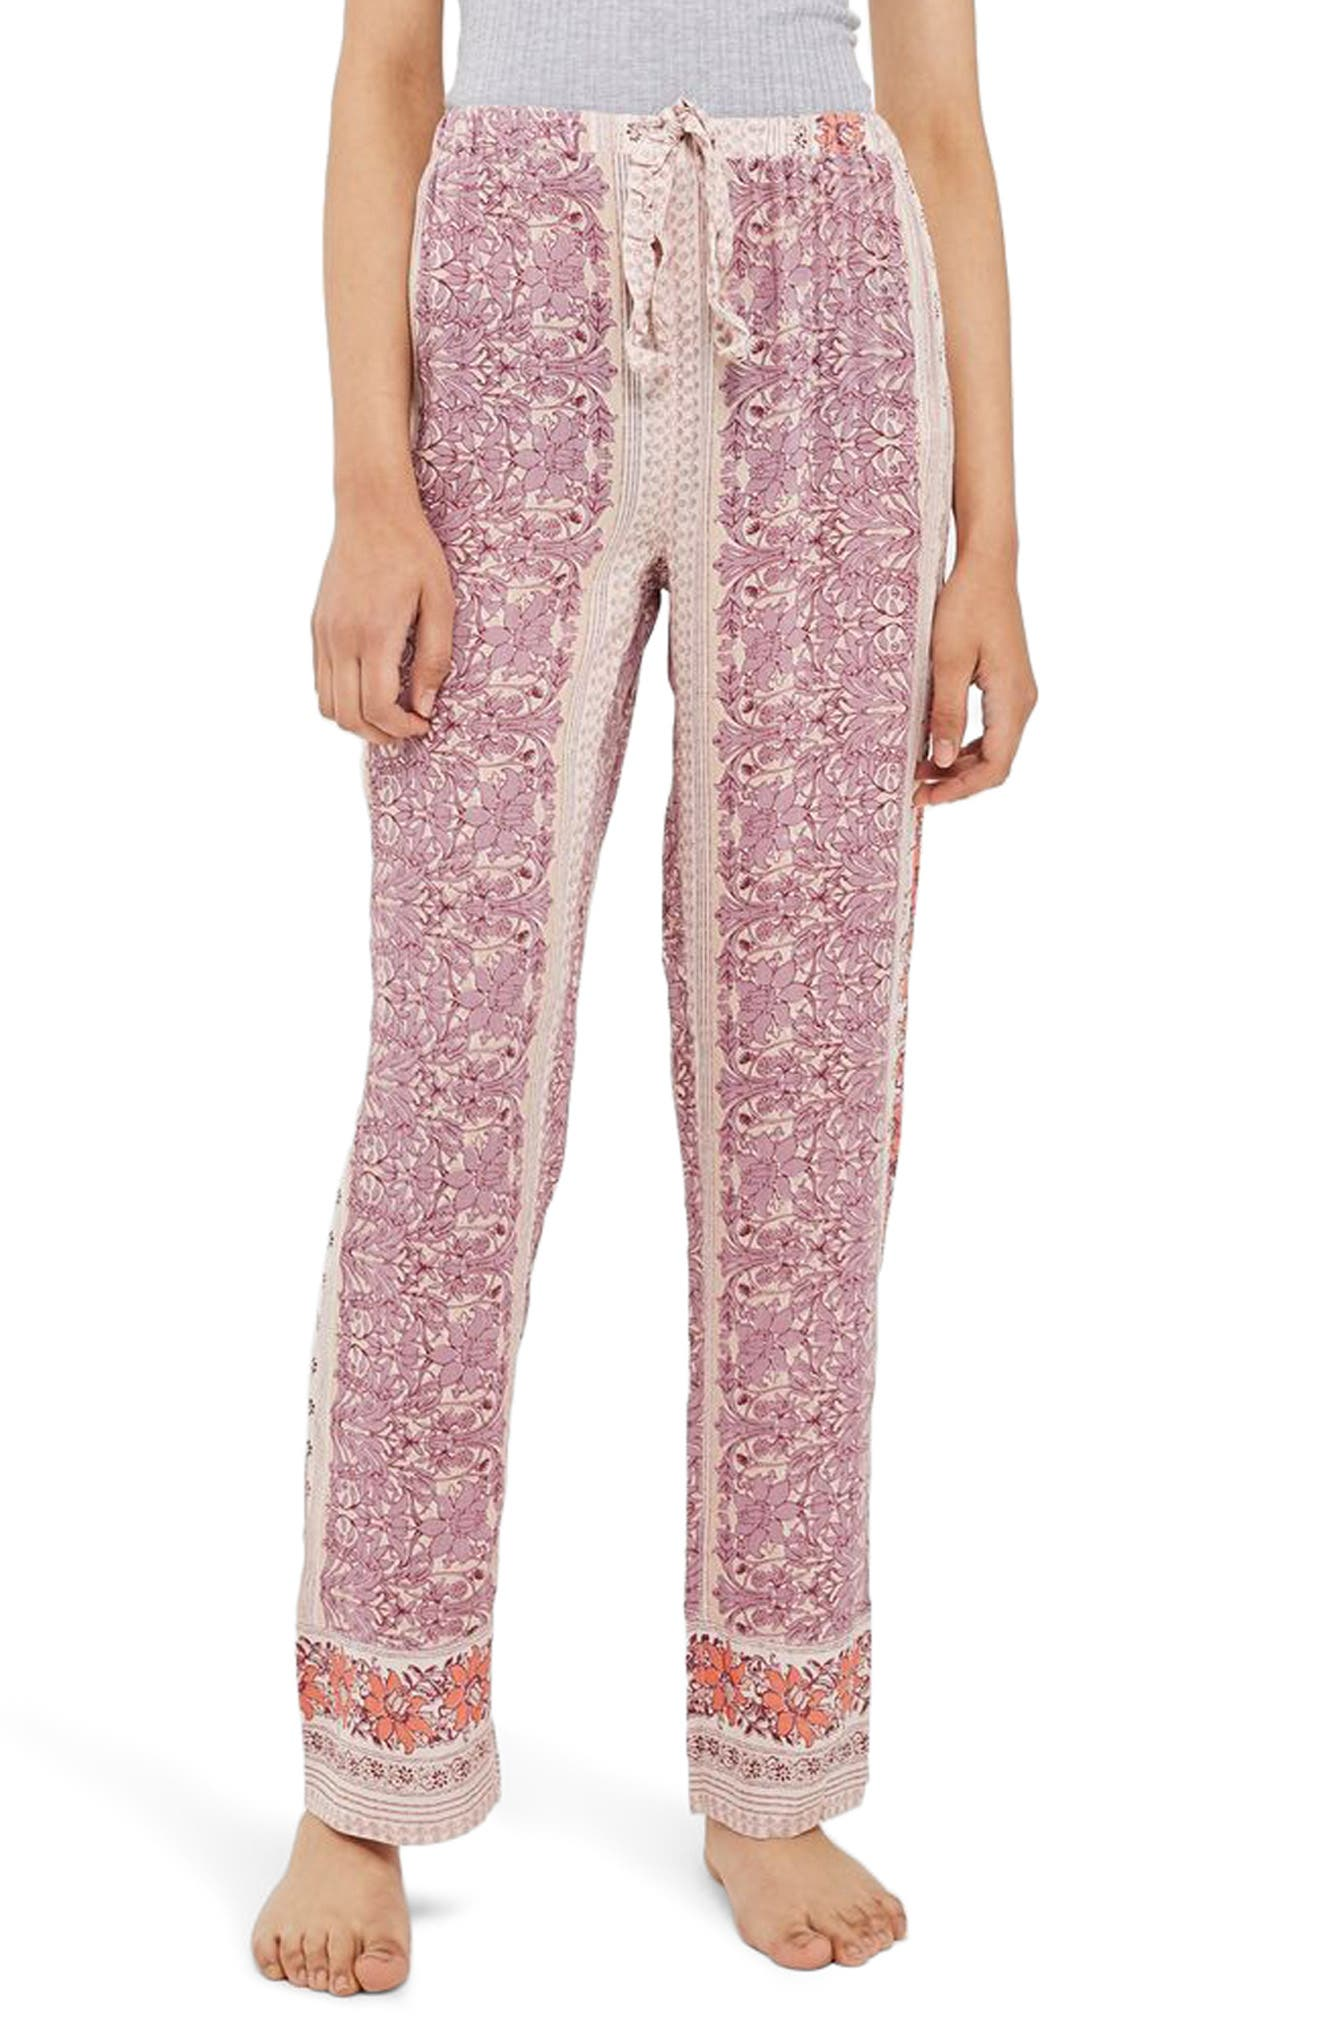 Bohemian Floral Print Pajama Pants,                         Main,                         color, Lilac Multi